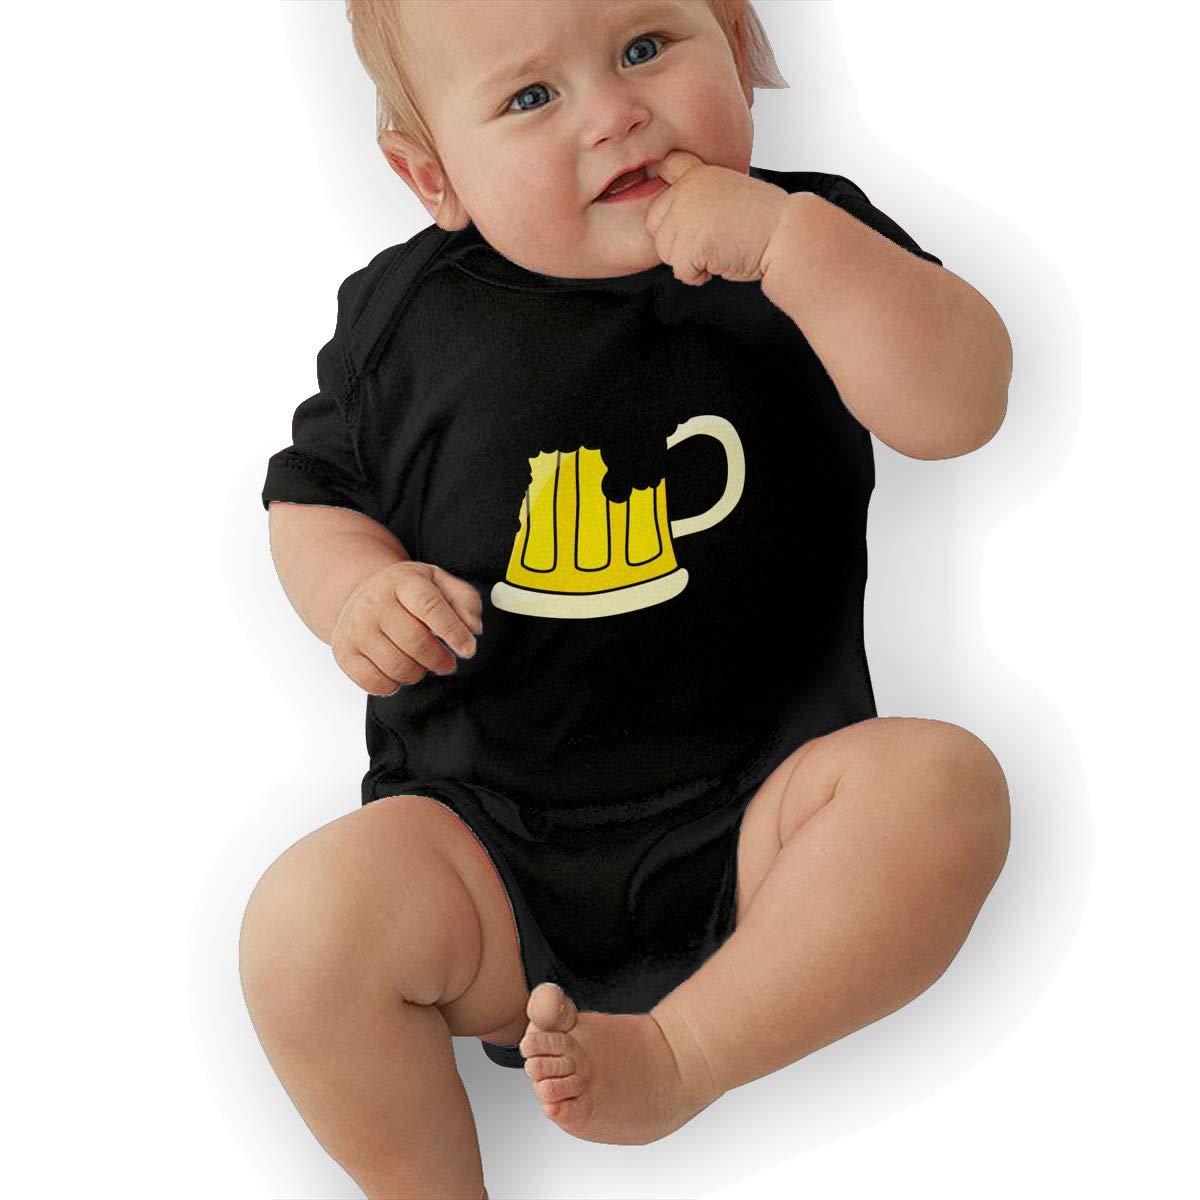 BONLOR Beer Baby Boys Girls Jumpsuits Short Sleeve Romper Bodysuit Bodysuit Jumpsuit Outfits Black